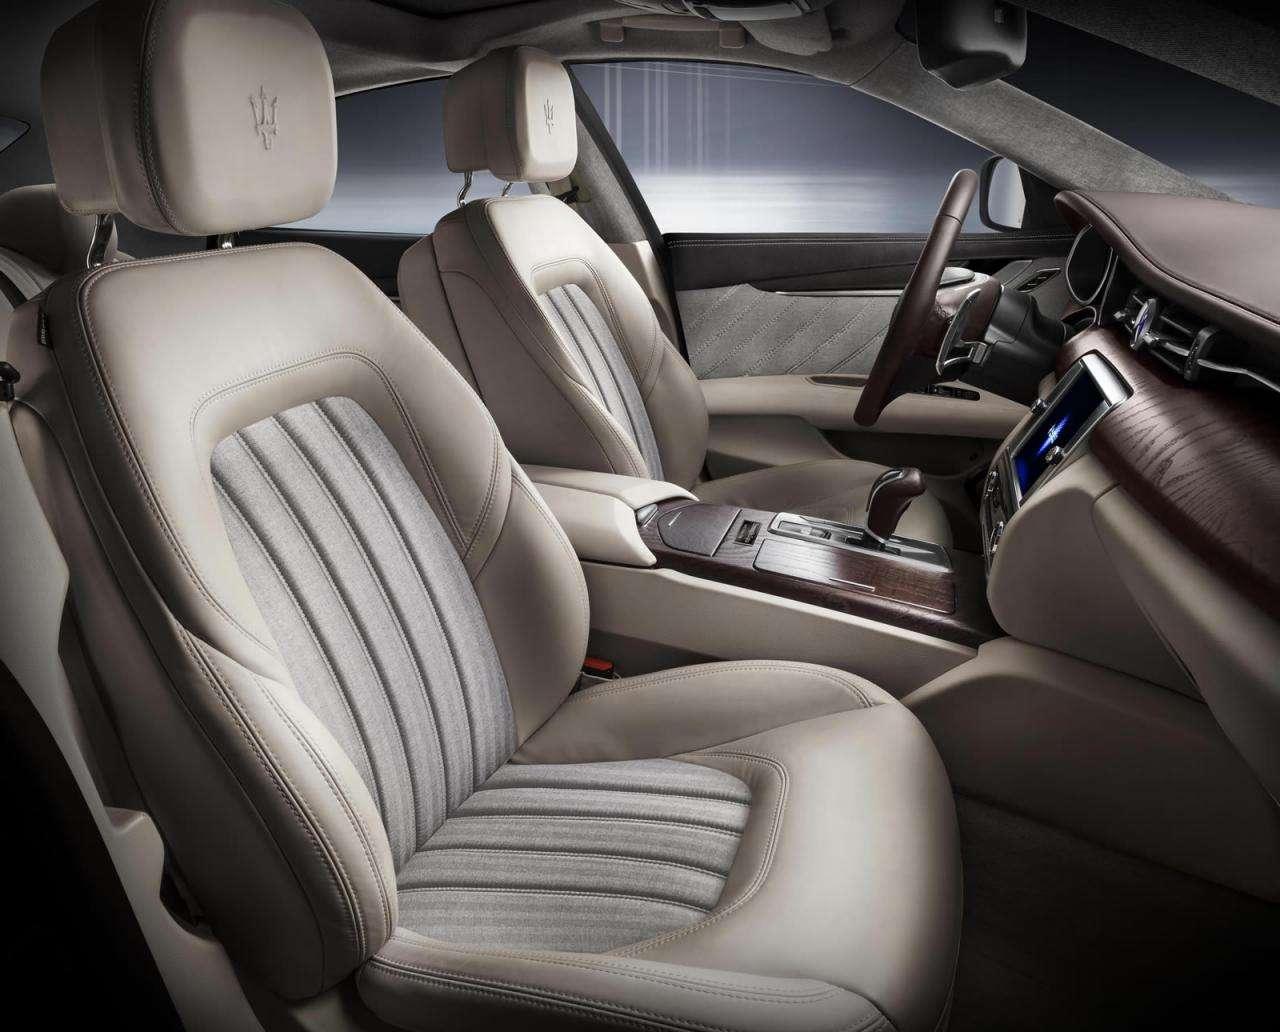 Maserati Quattroporte Frankfurt 2013